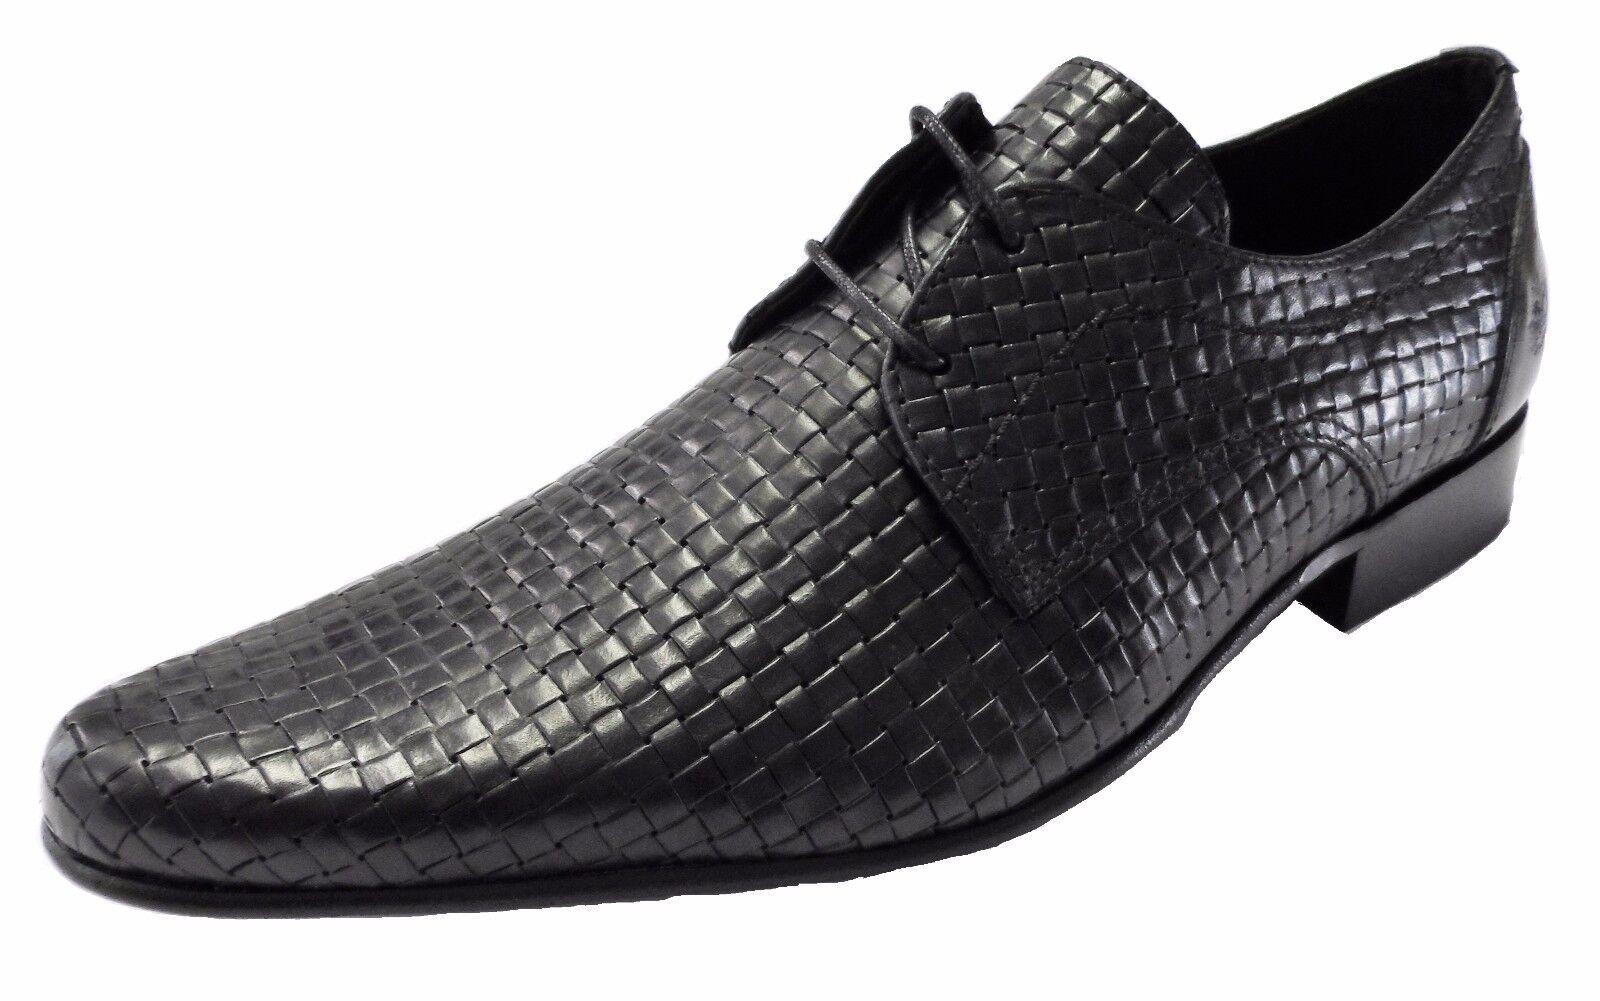 Ikon MOD ORIGINAL BUCKLER Weave Negro MOD Ikon JAM Zapatos… 53fad3